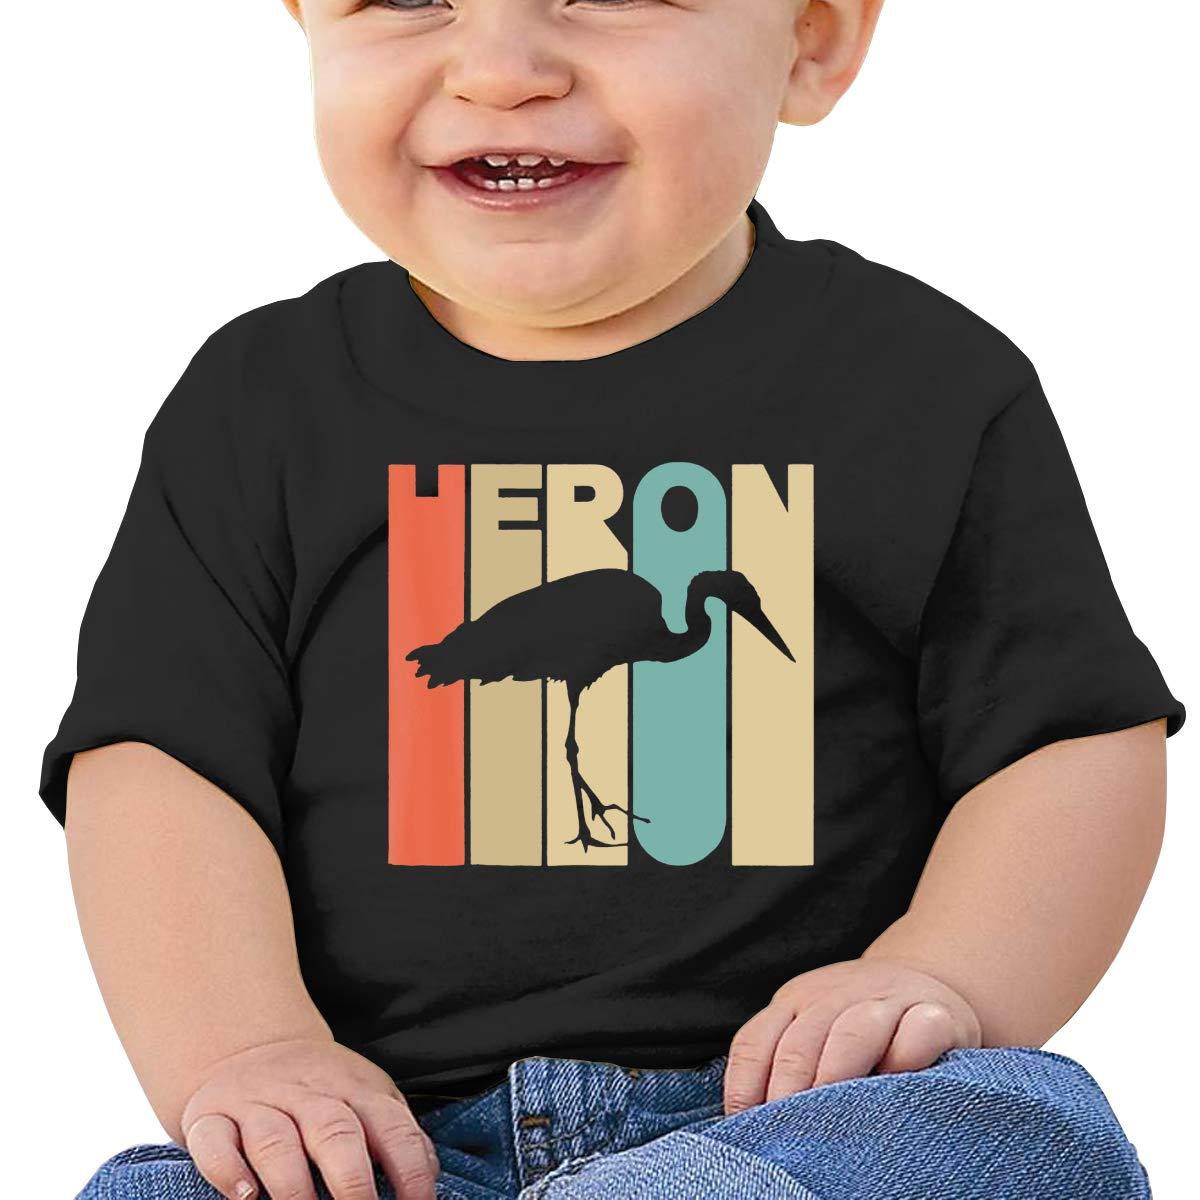 Vintage Style Heron Silhouette Boy Girl Newborn Short Sleeve T-Shirt 6-24 Month Cotton Tops